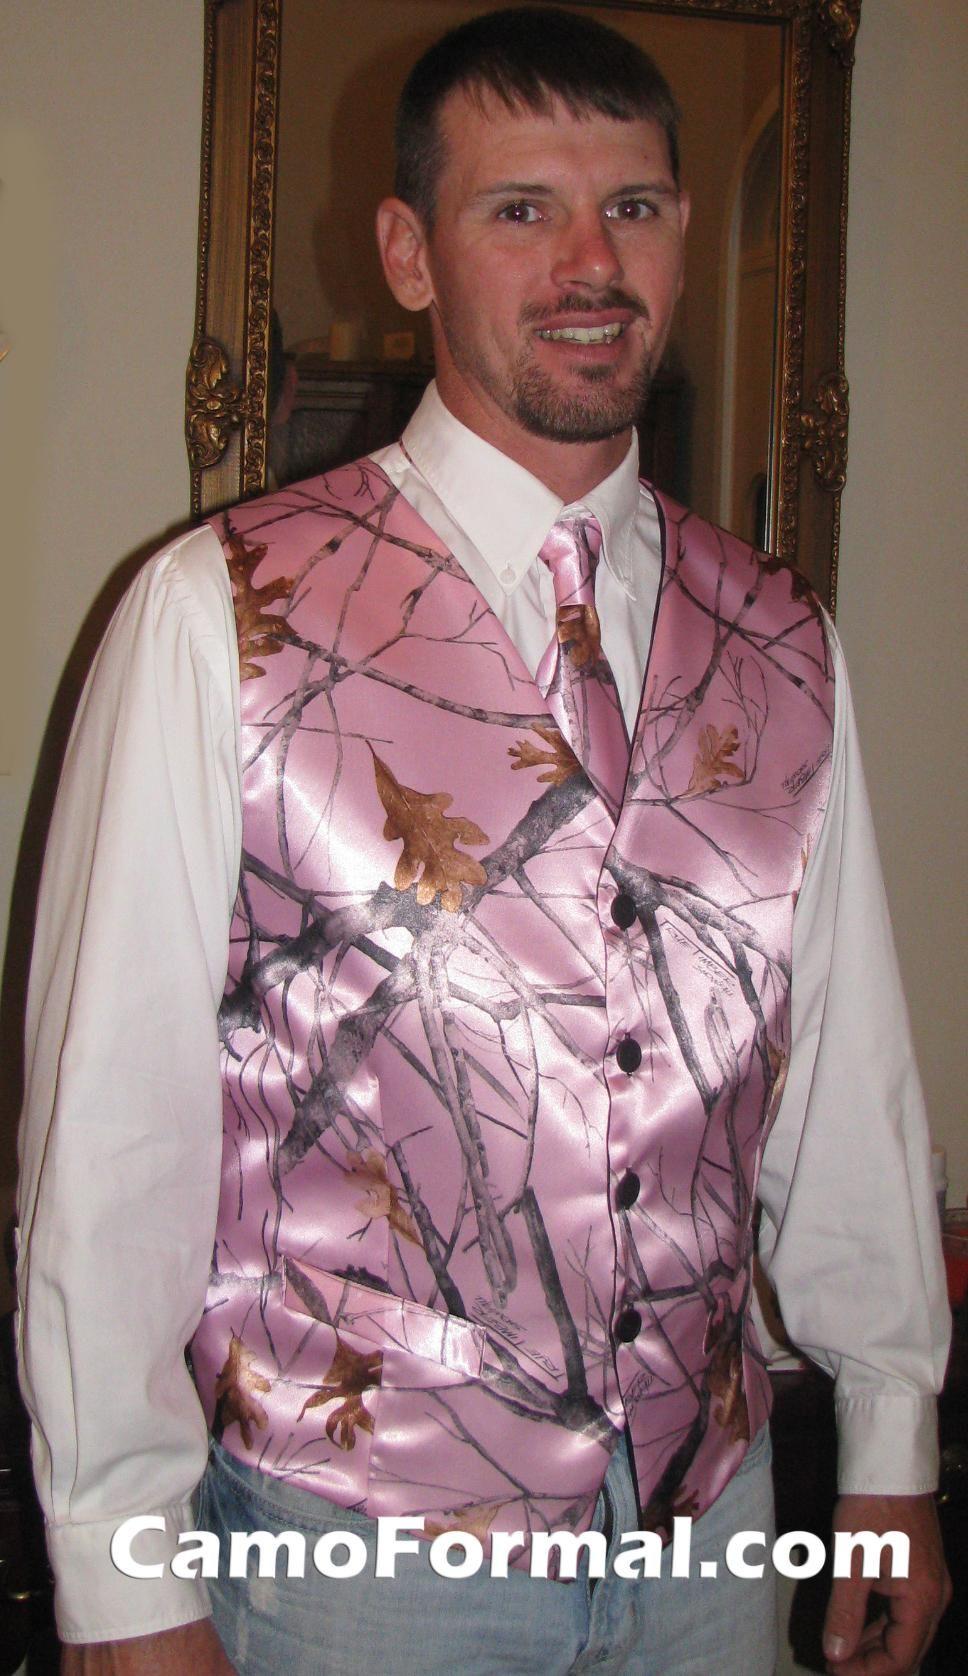 Camo wedding help wedding dresses ideas weddings camo formal mens